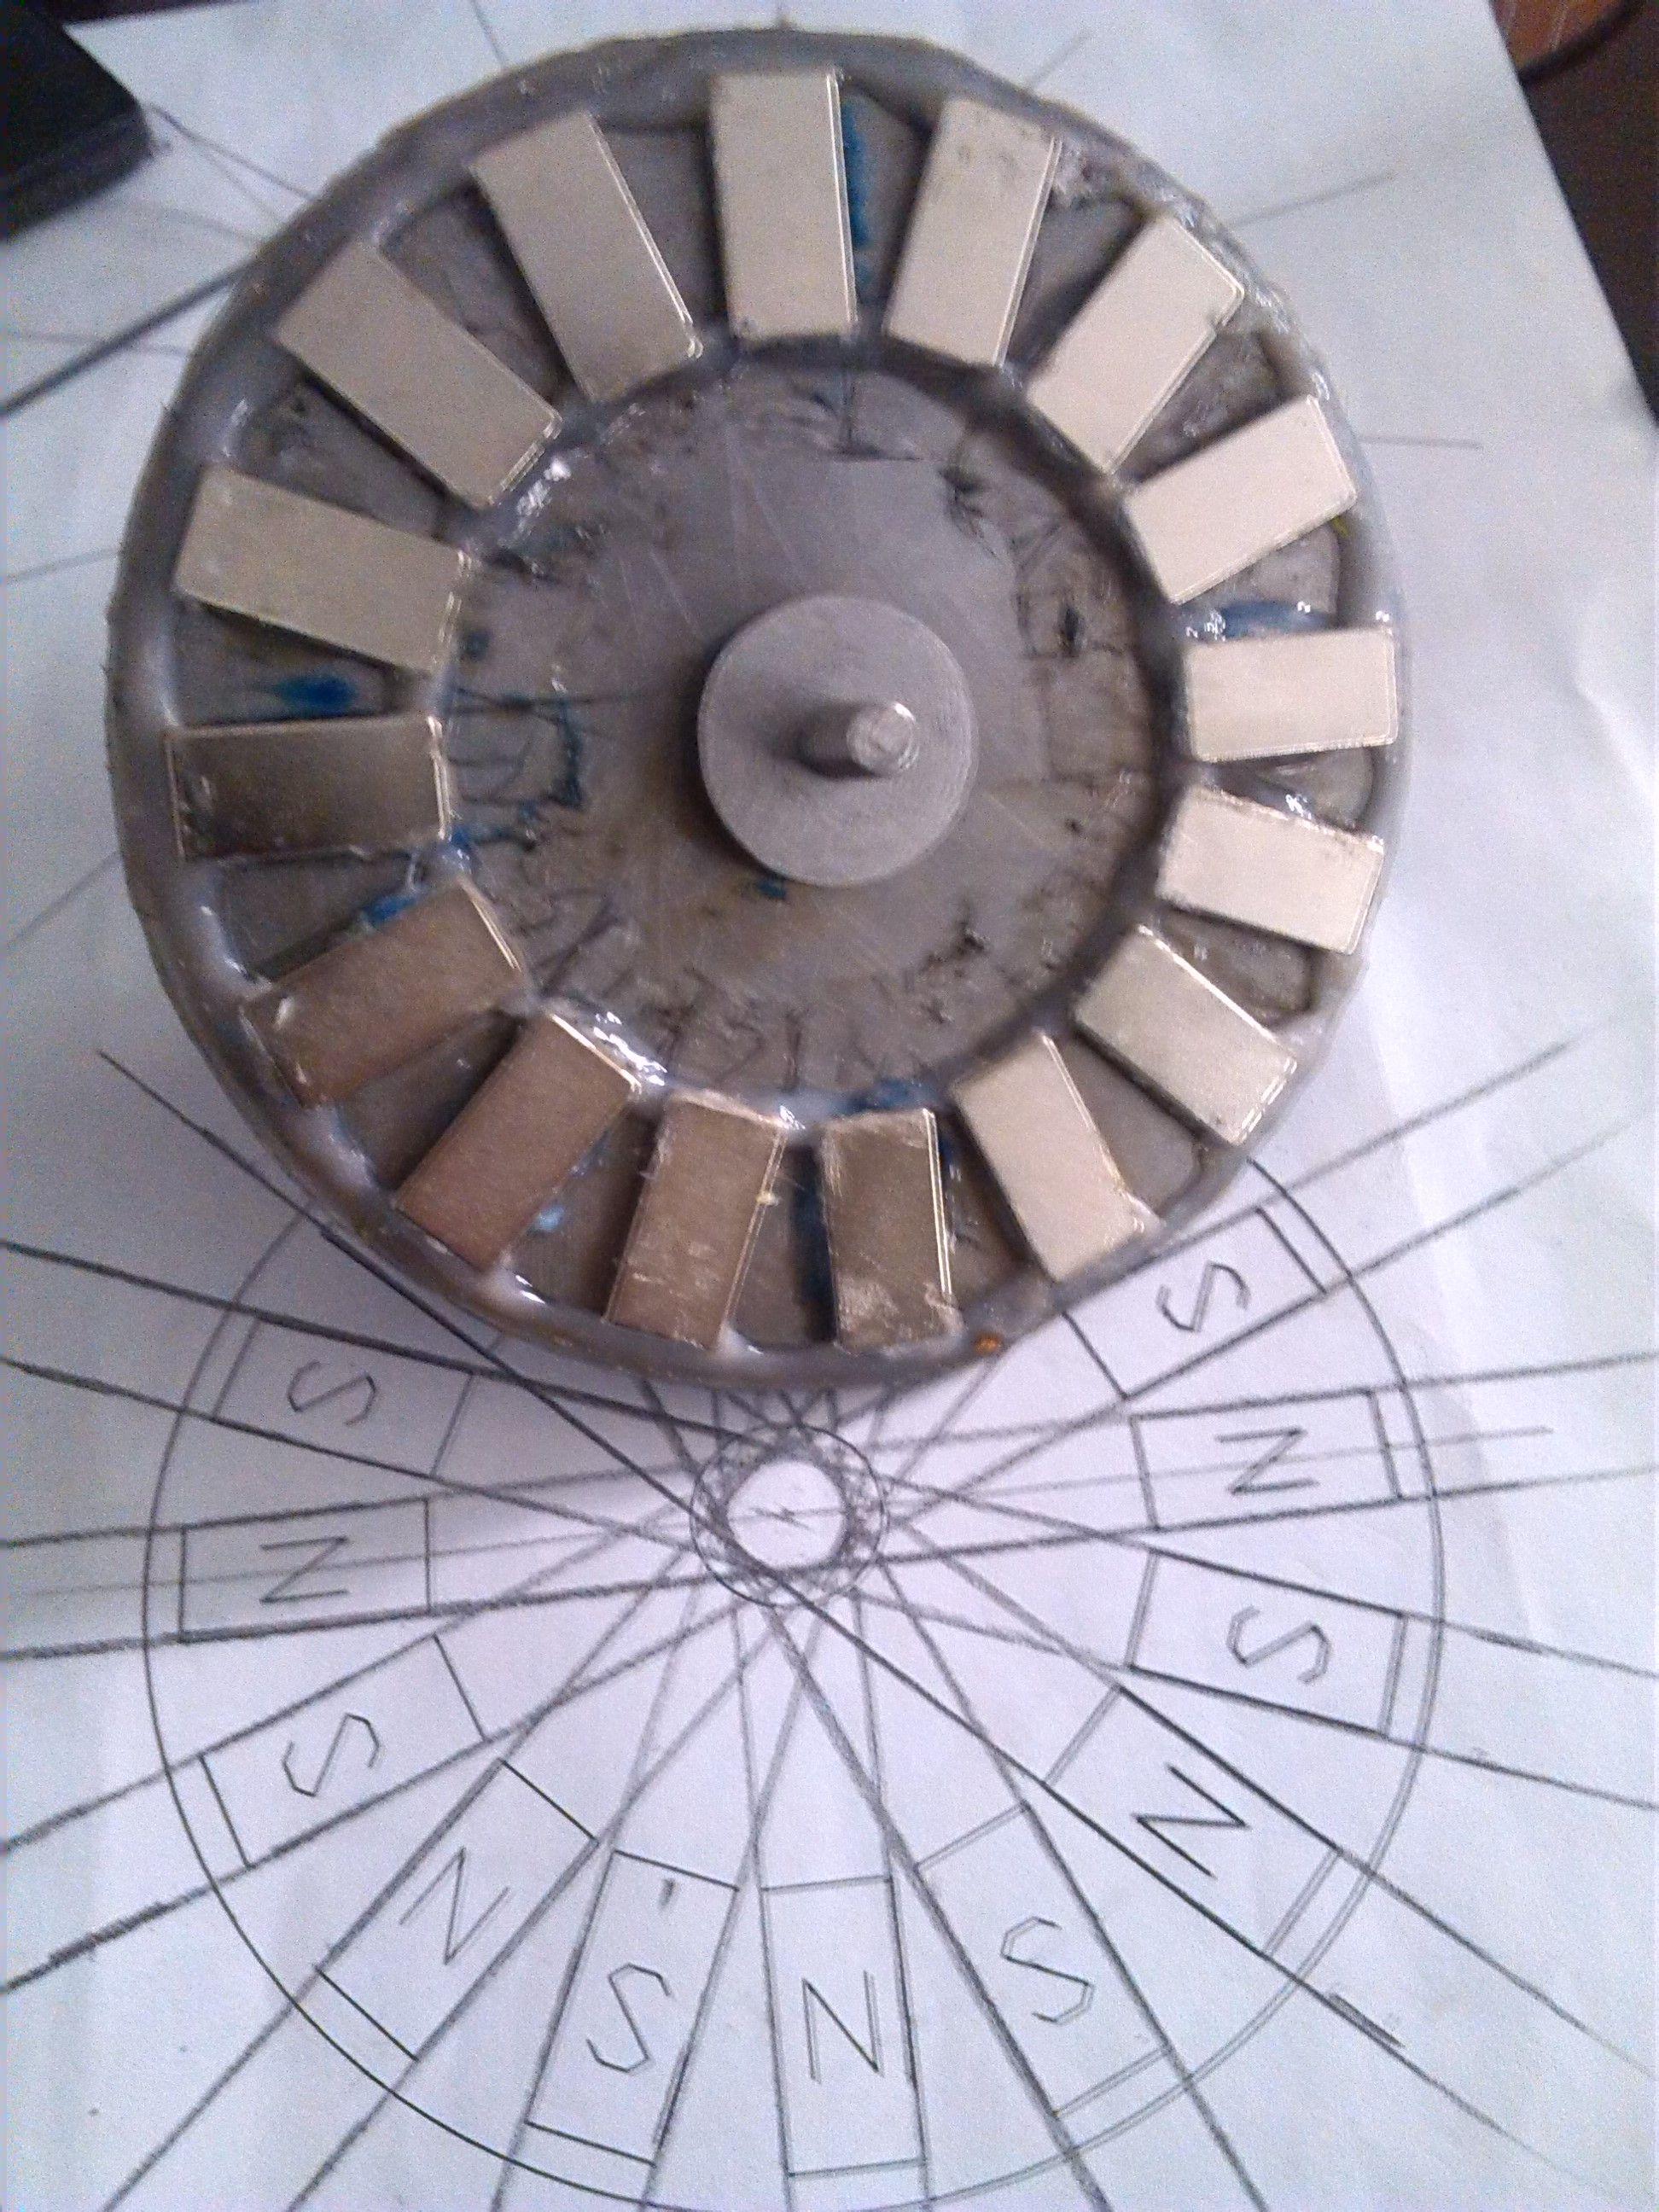 盘式发电机磁体到底怎么放